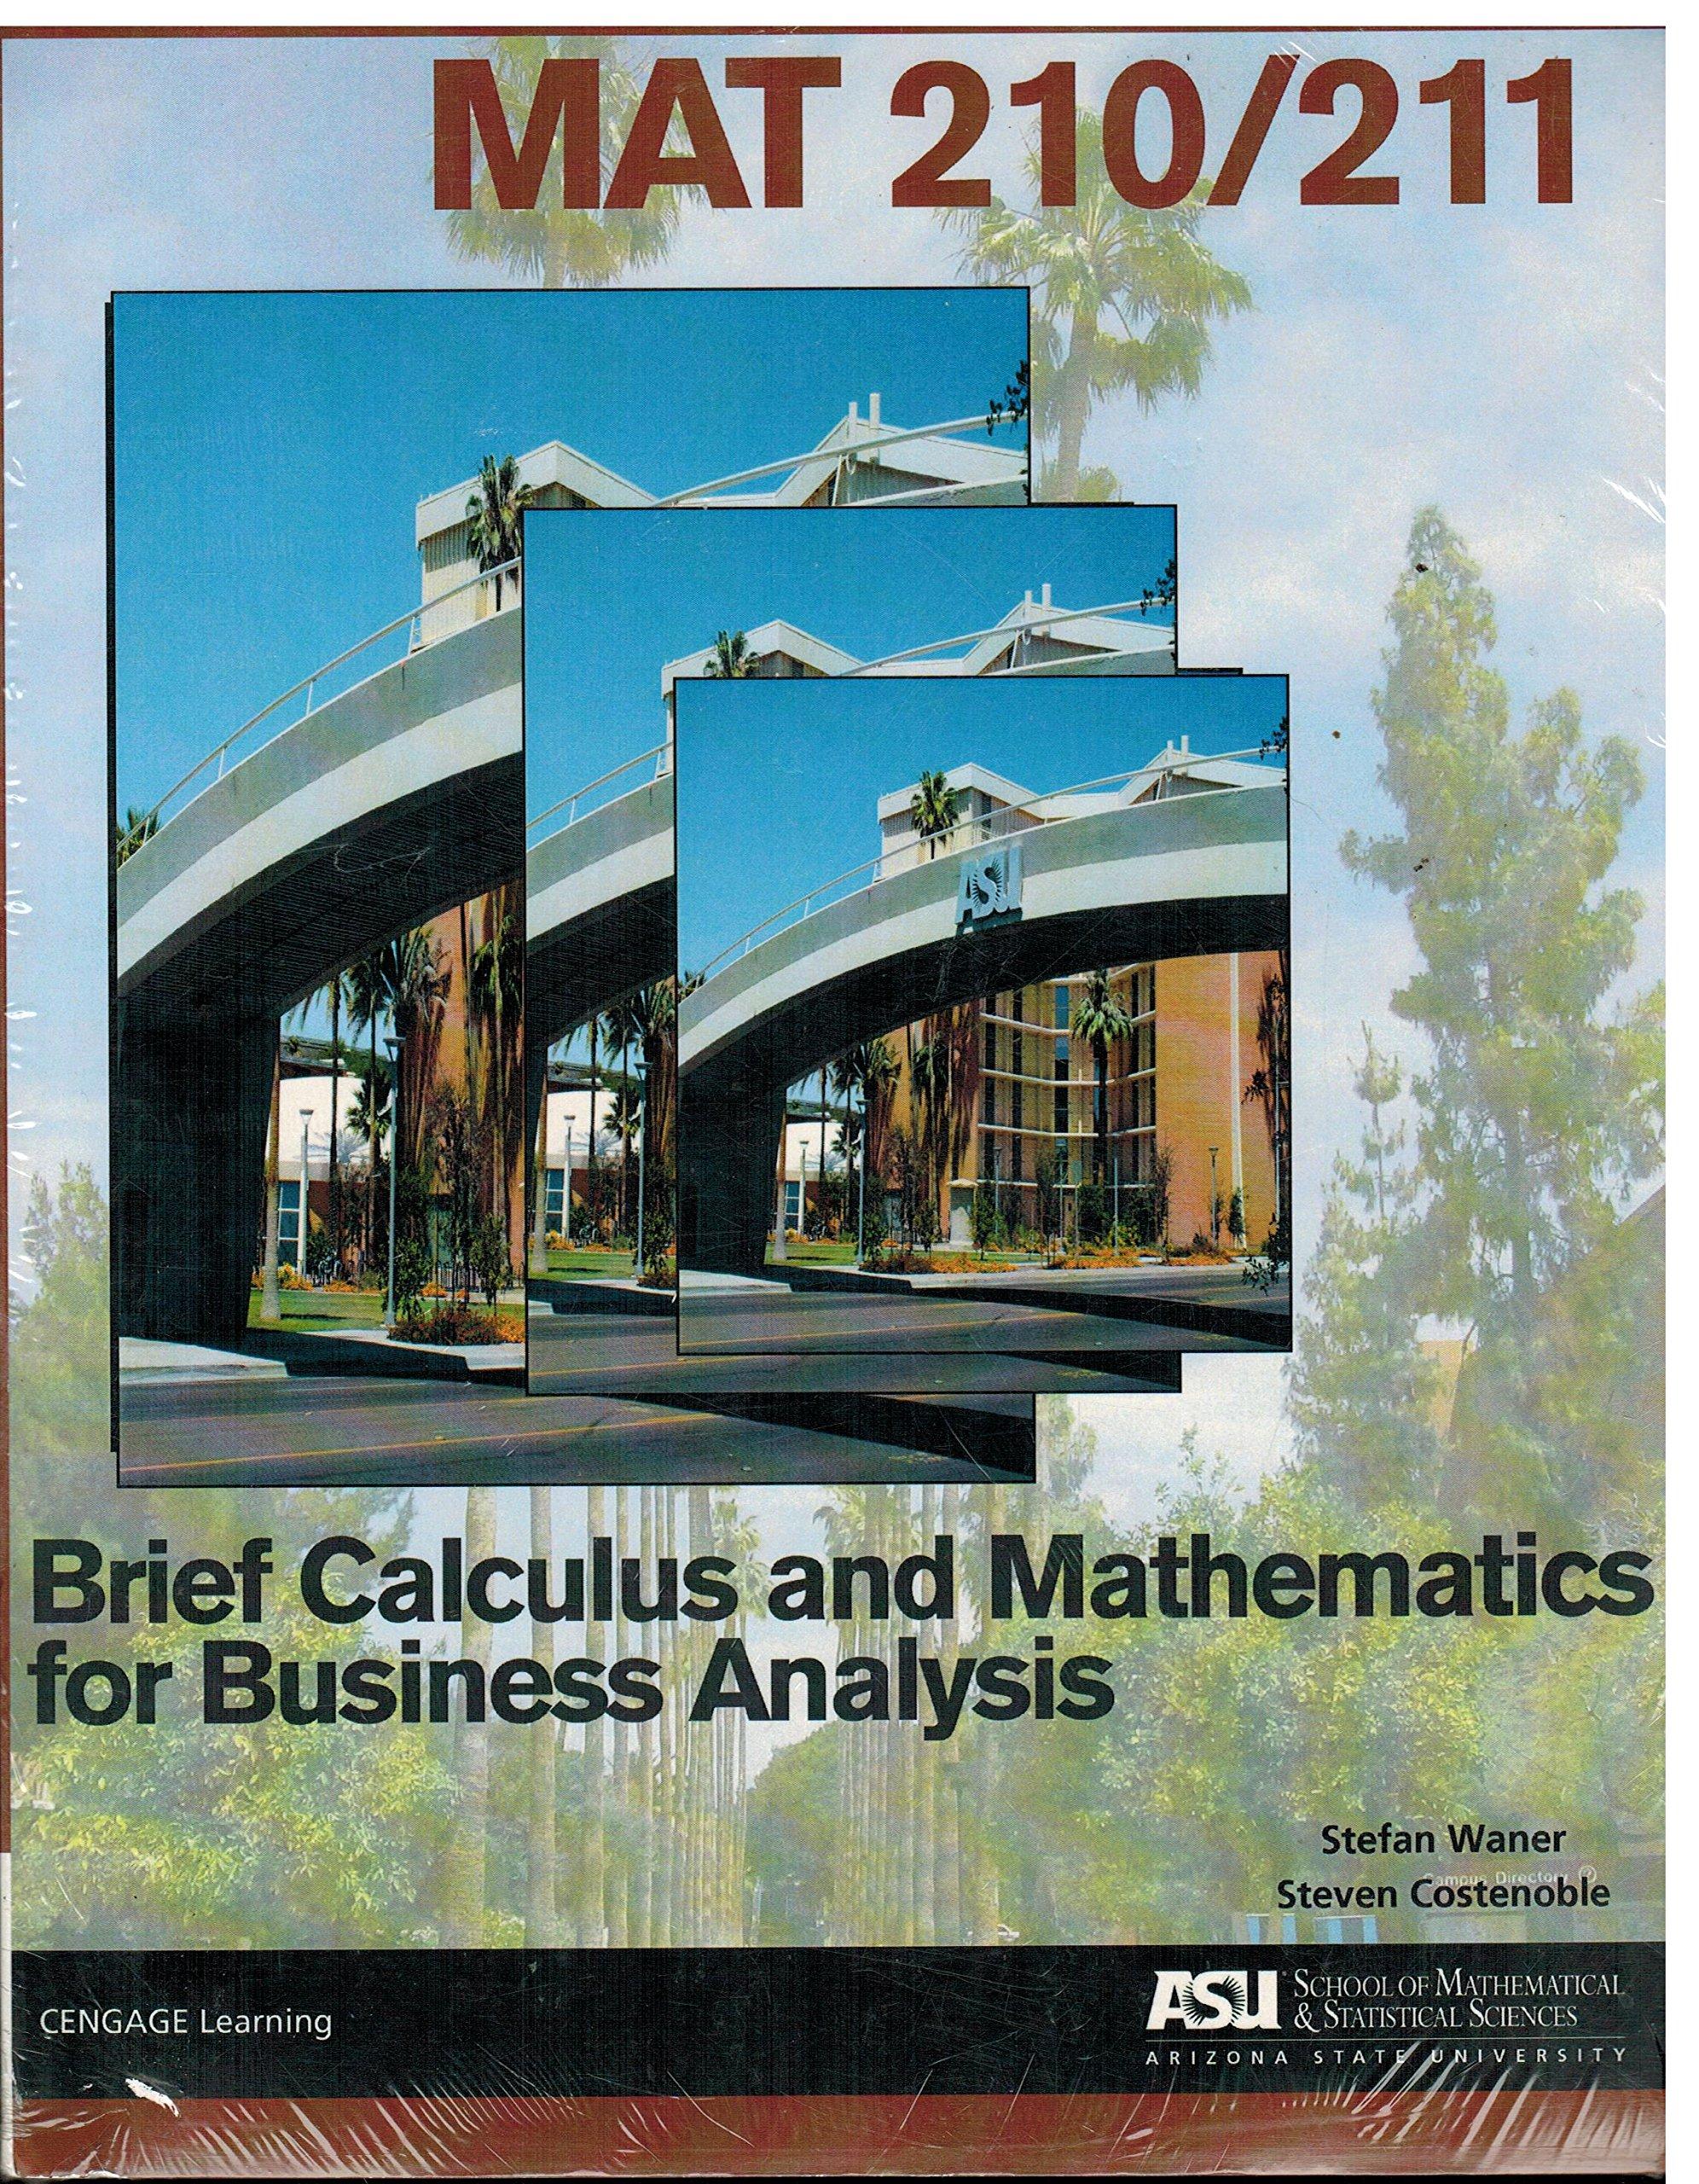 ASU MAT 210/211 6th Edition Bundle Brief Calculus and Mathematics for Business Analysis pdf